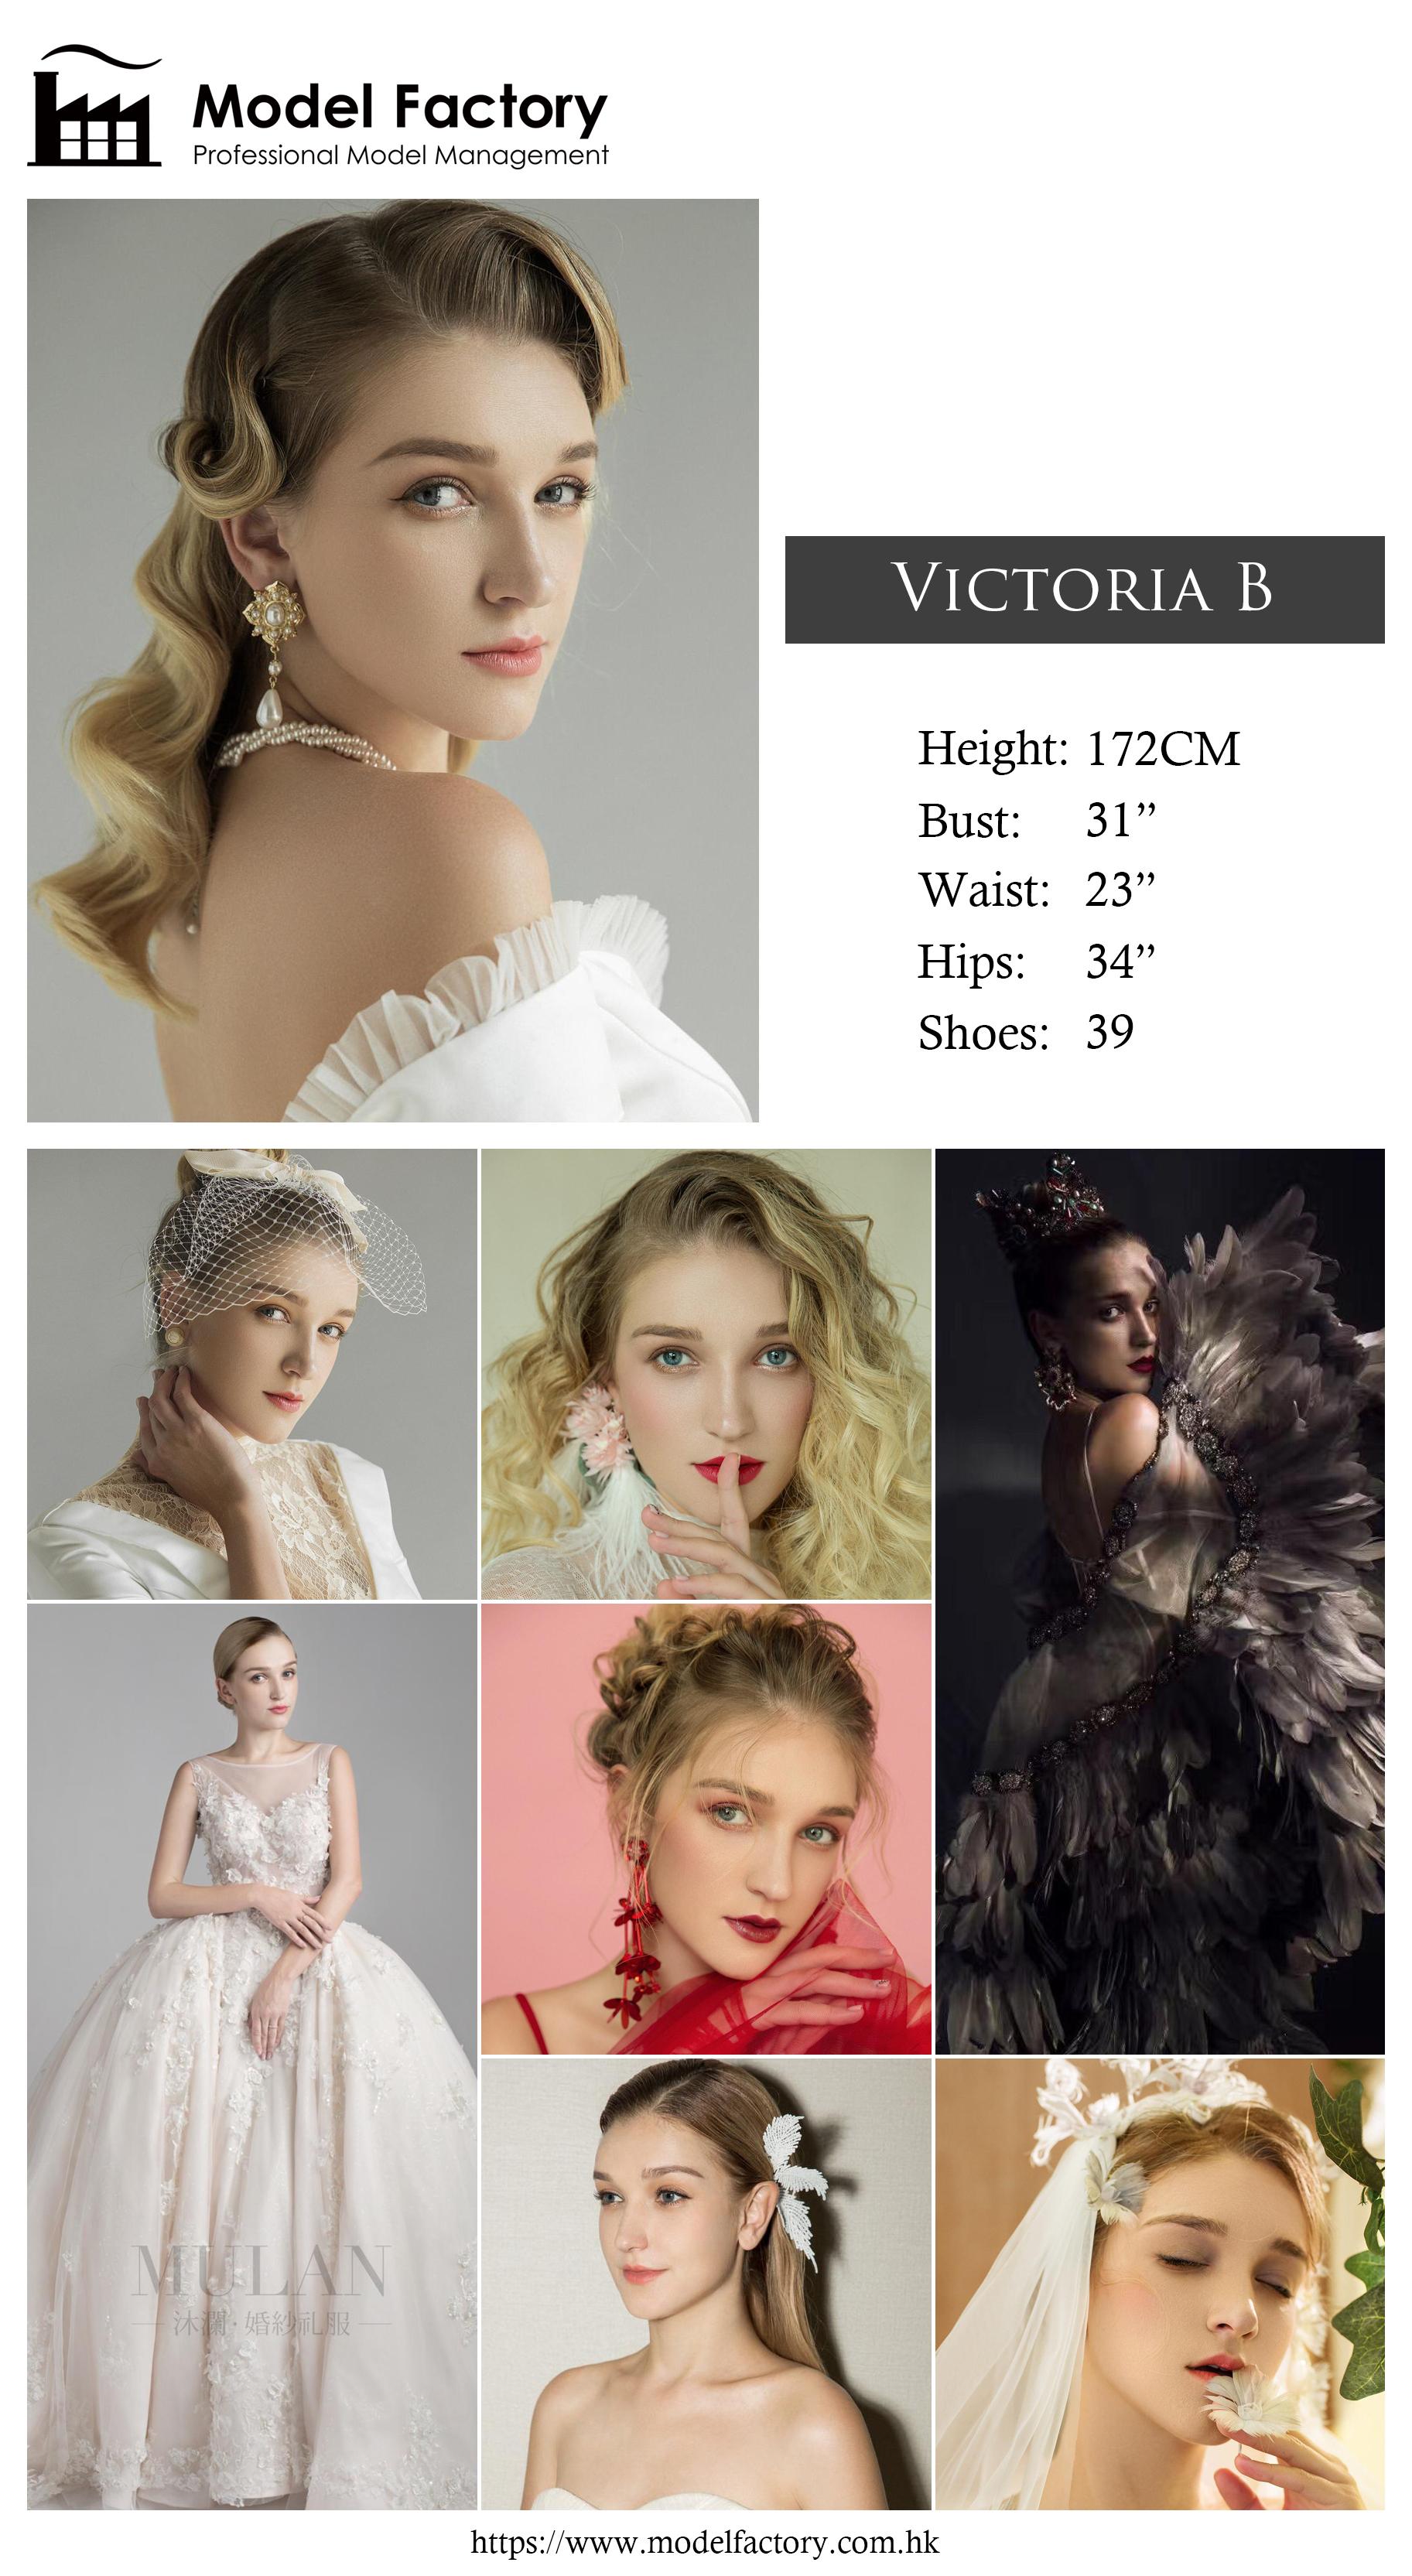 Model Factory Caucasian Female Model VictoriaB